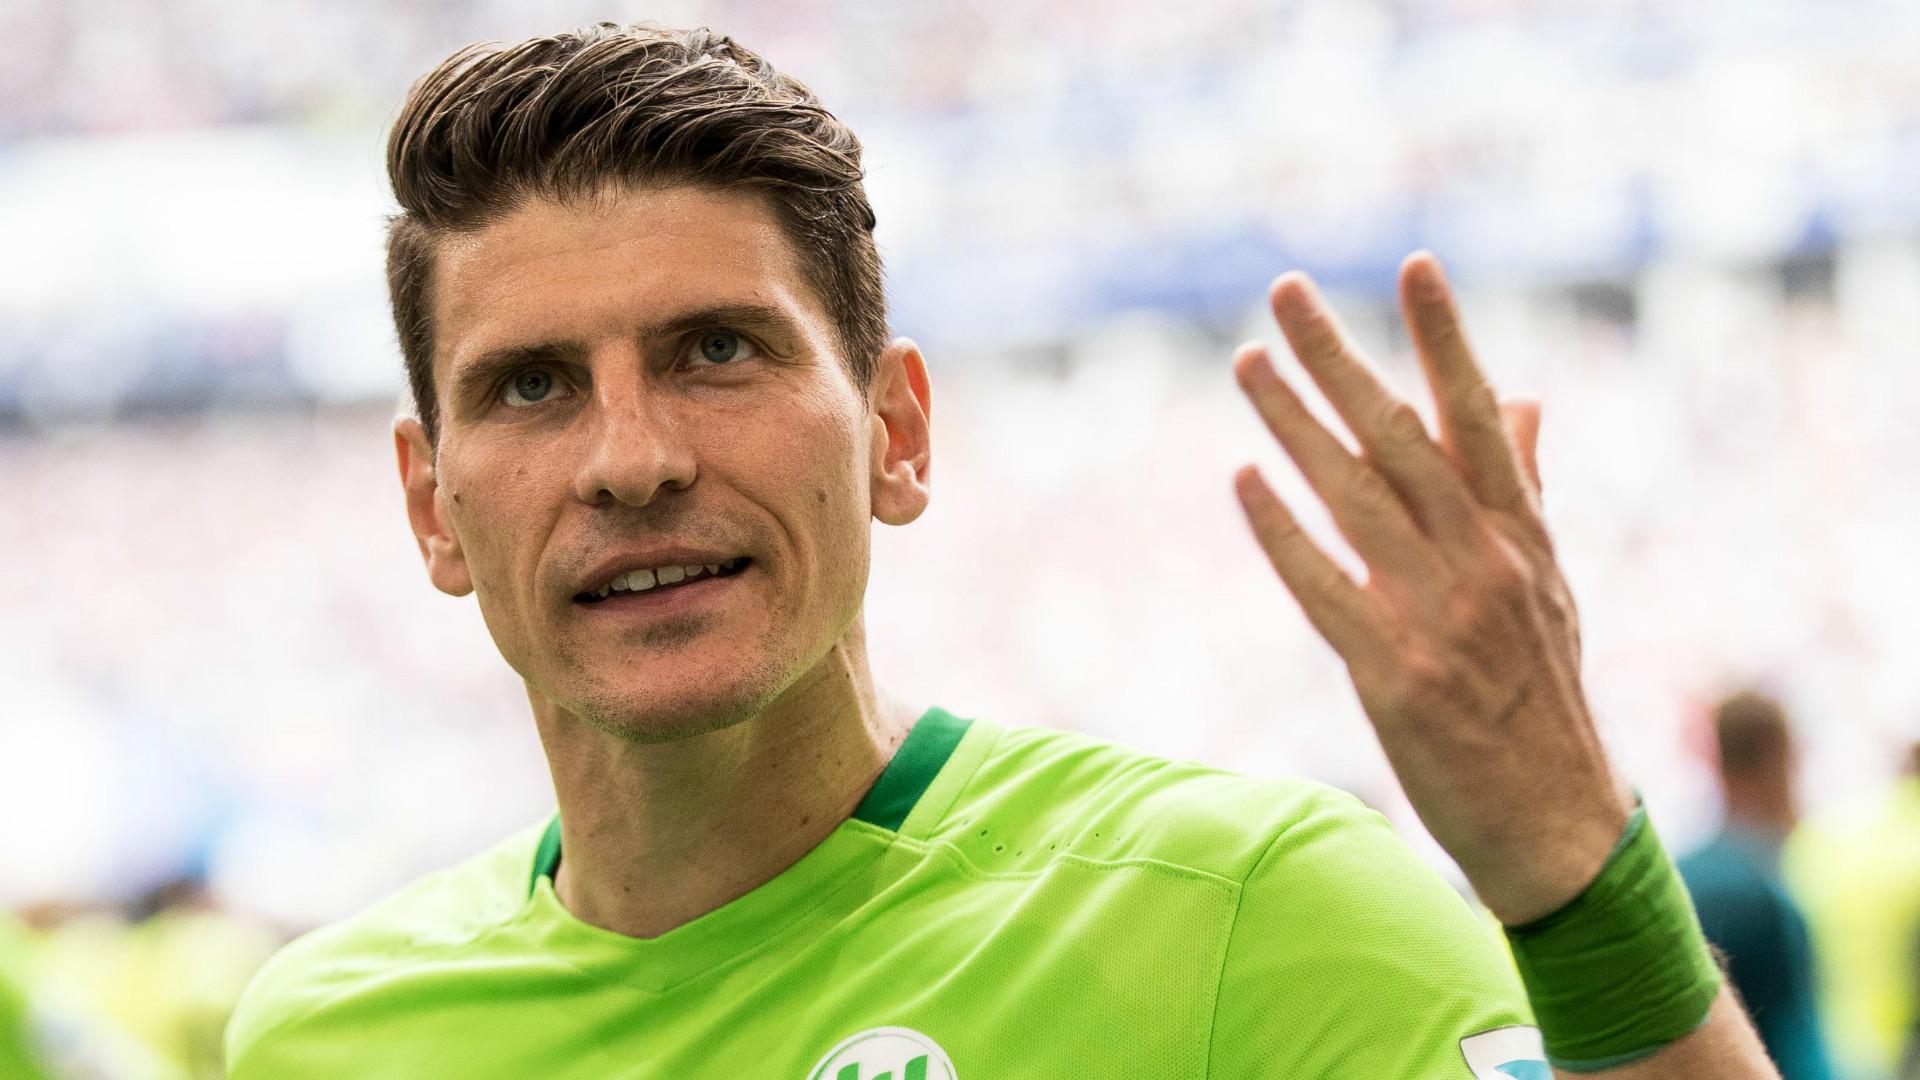 L'attaquant Mario Gomez (32 ans) quitte Wolfsburg pour s'engager avec Stuttgart — Bundesliga